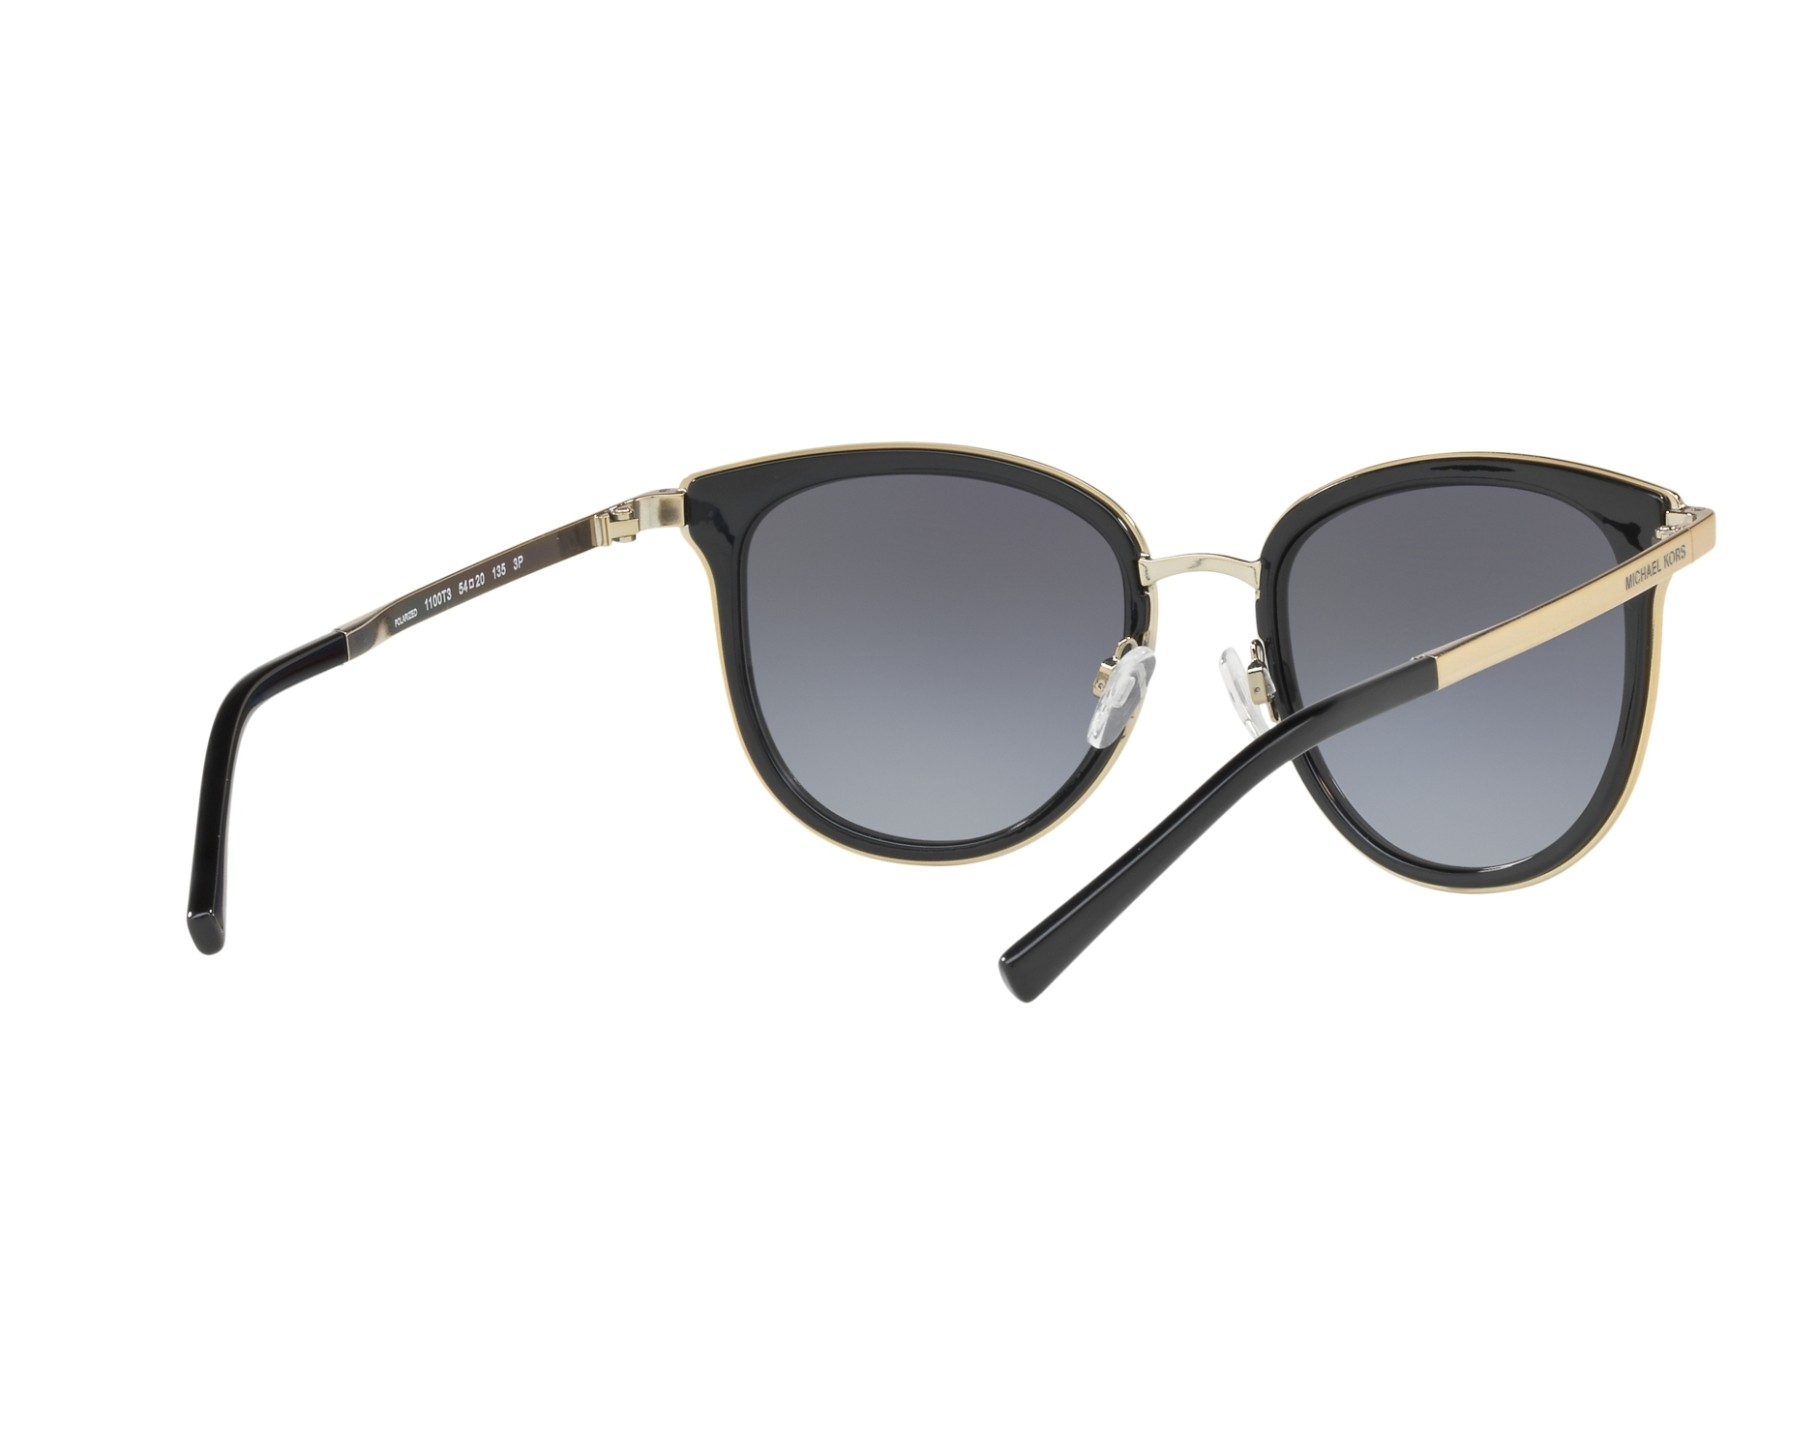 76a2236b65d54 Sunglasses Michael Kors MK-1010 1100T3 54-20 Black Gold 360 degree view 8